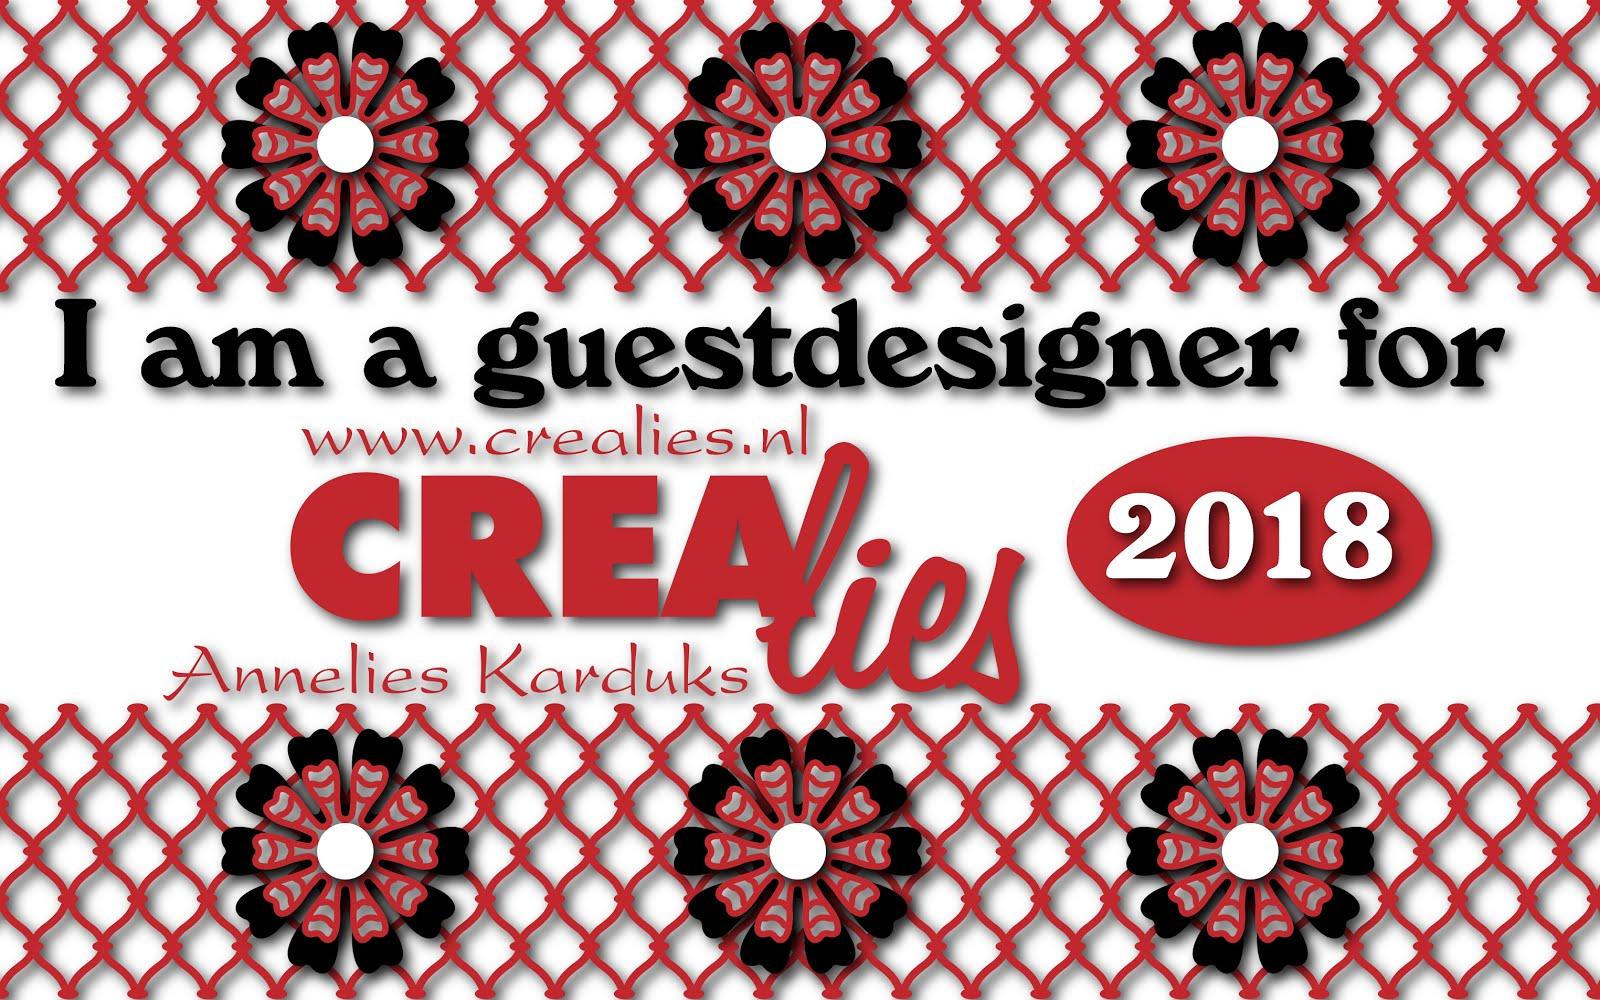 CREALIES guest designer